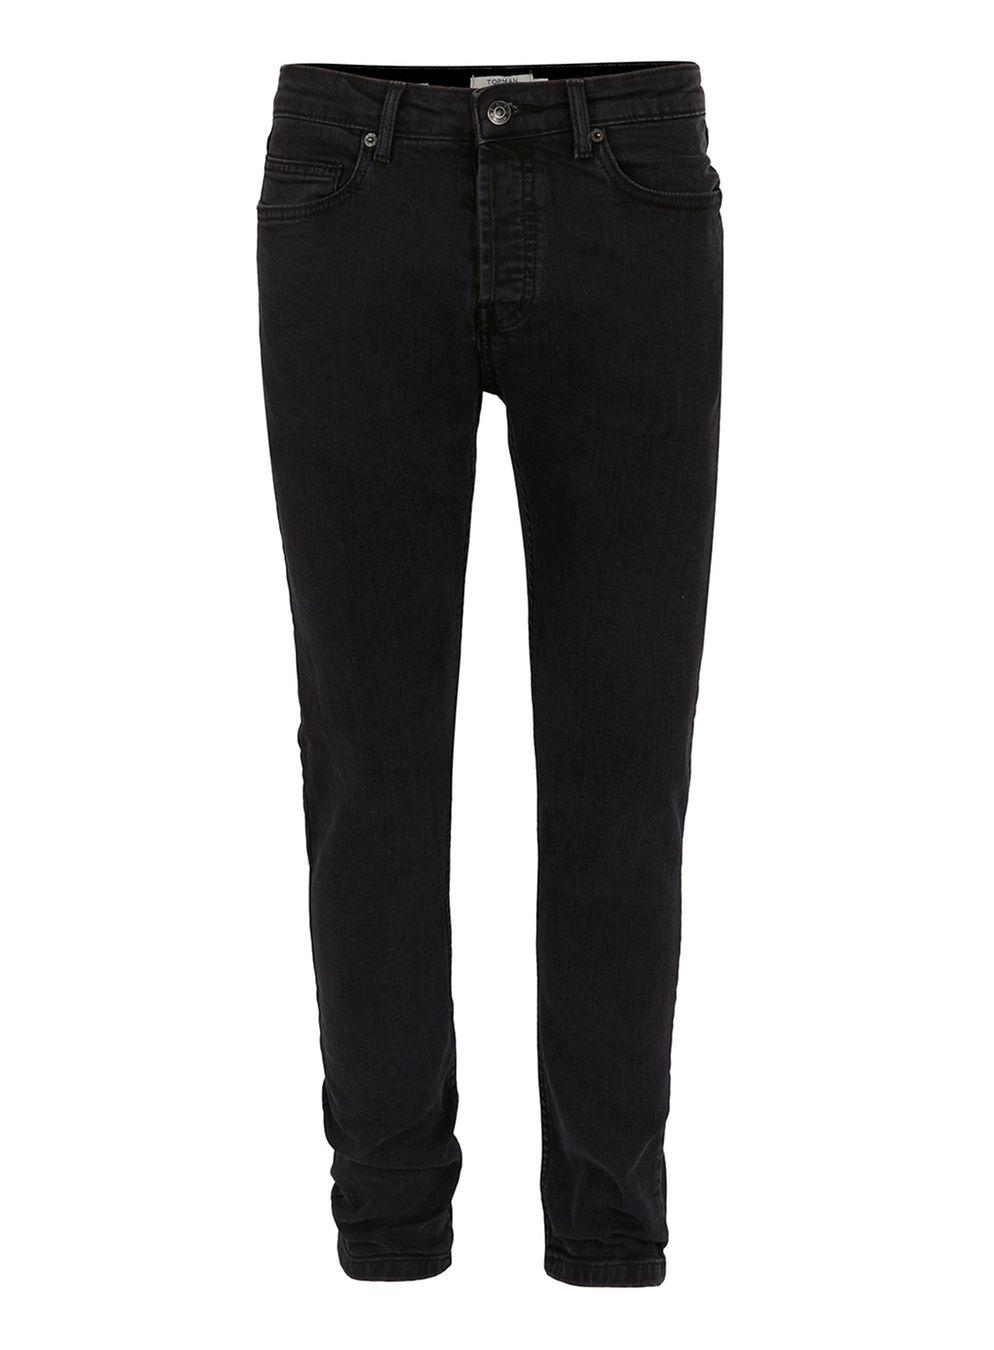 Topman Skinny Black Jeans